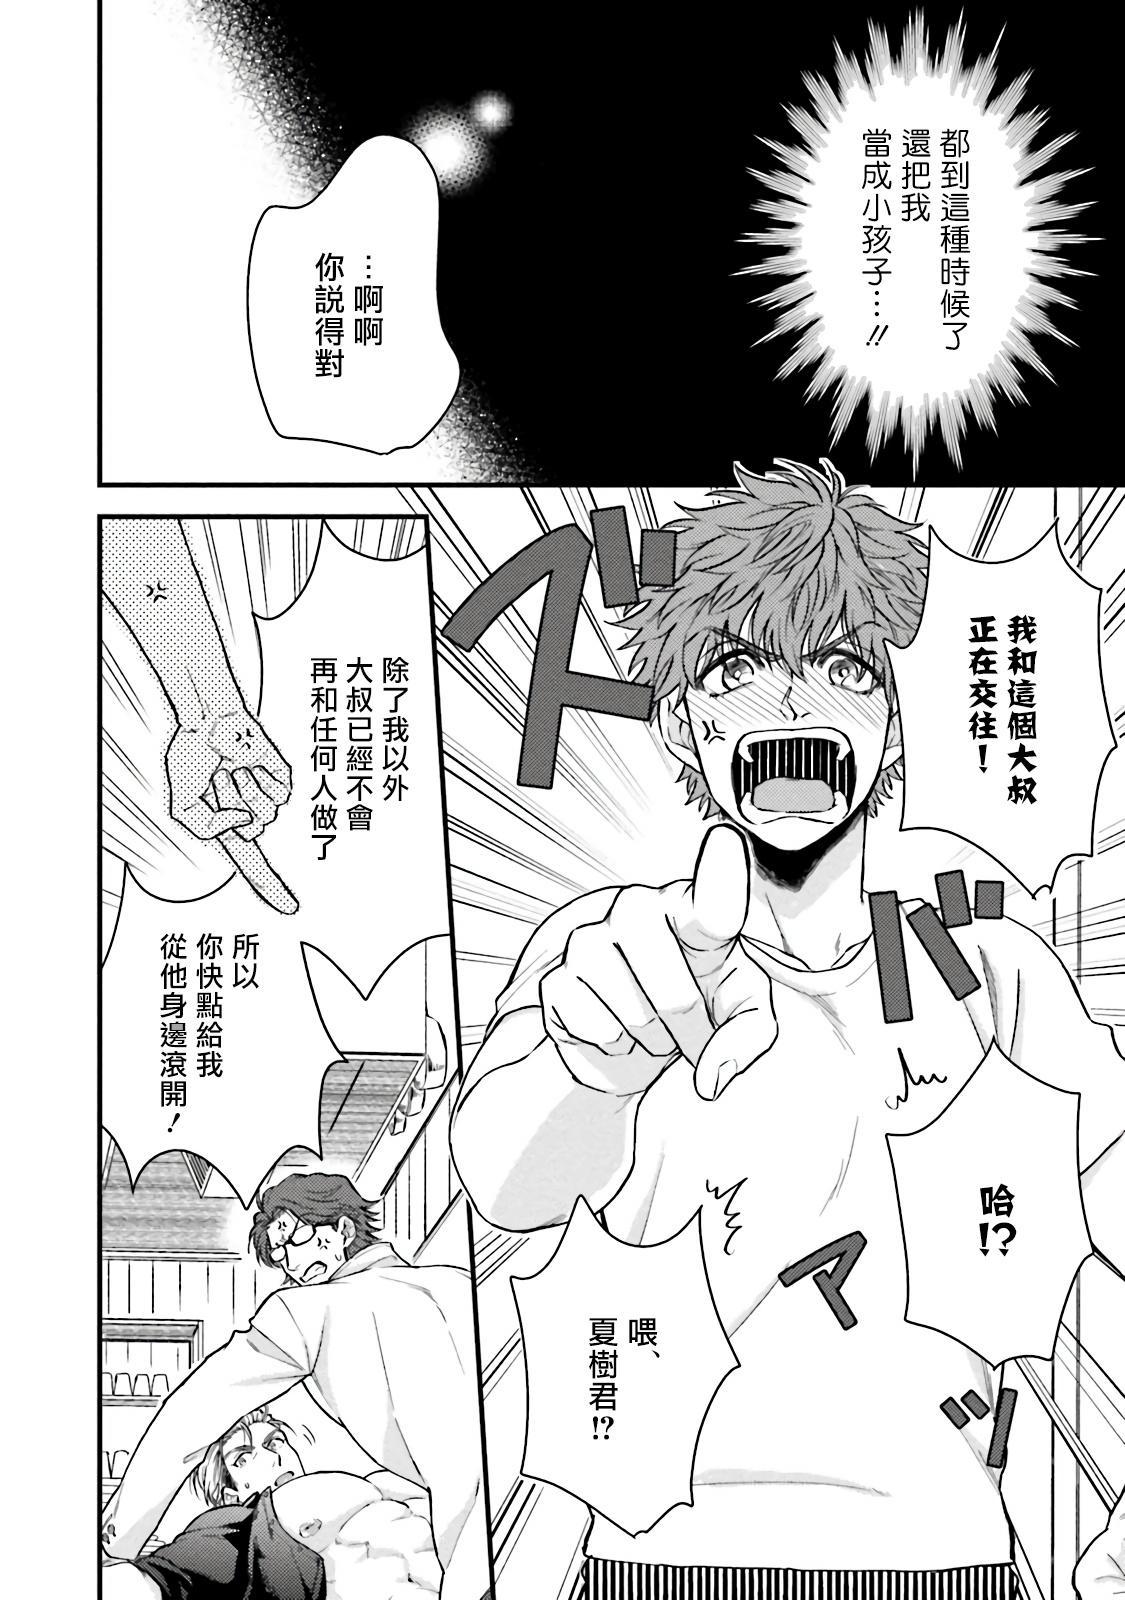 Kinou wa Otanoshimi Deshita ne | 昨天过得很愉快吧 Ch. 1-4+特典 27